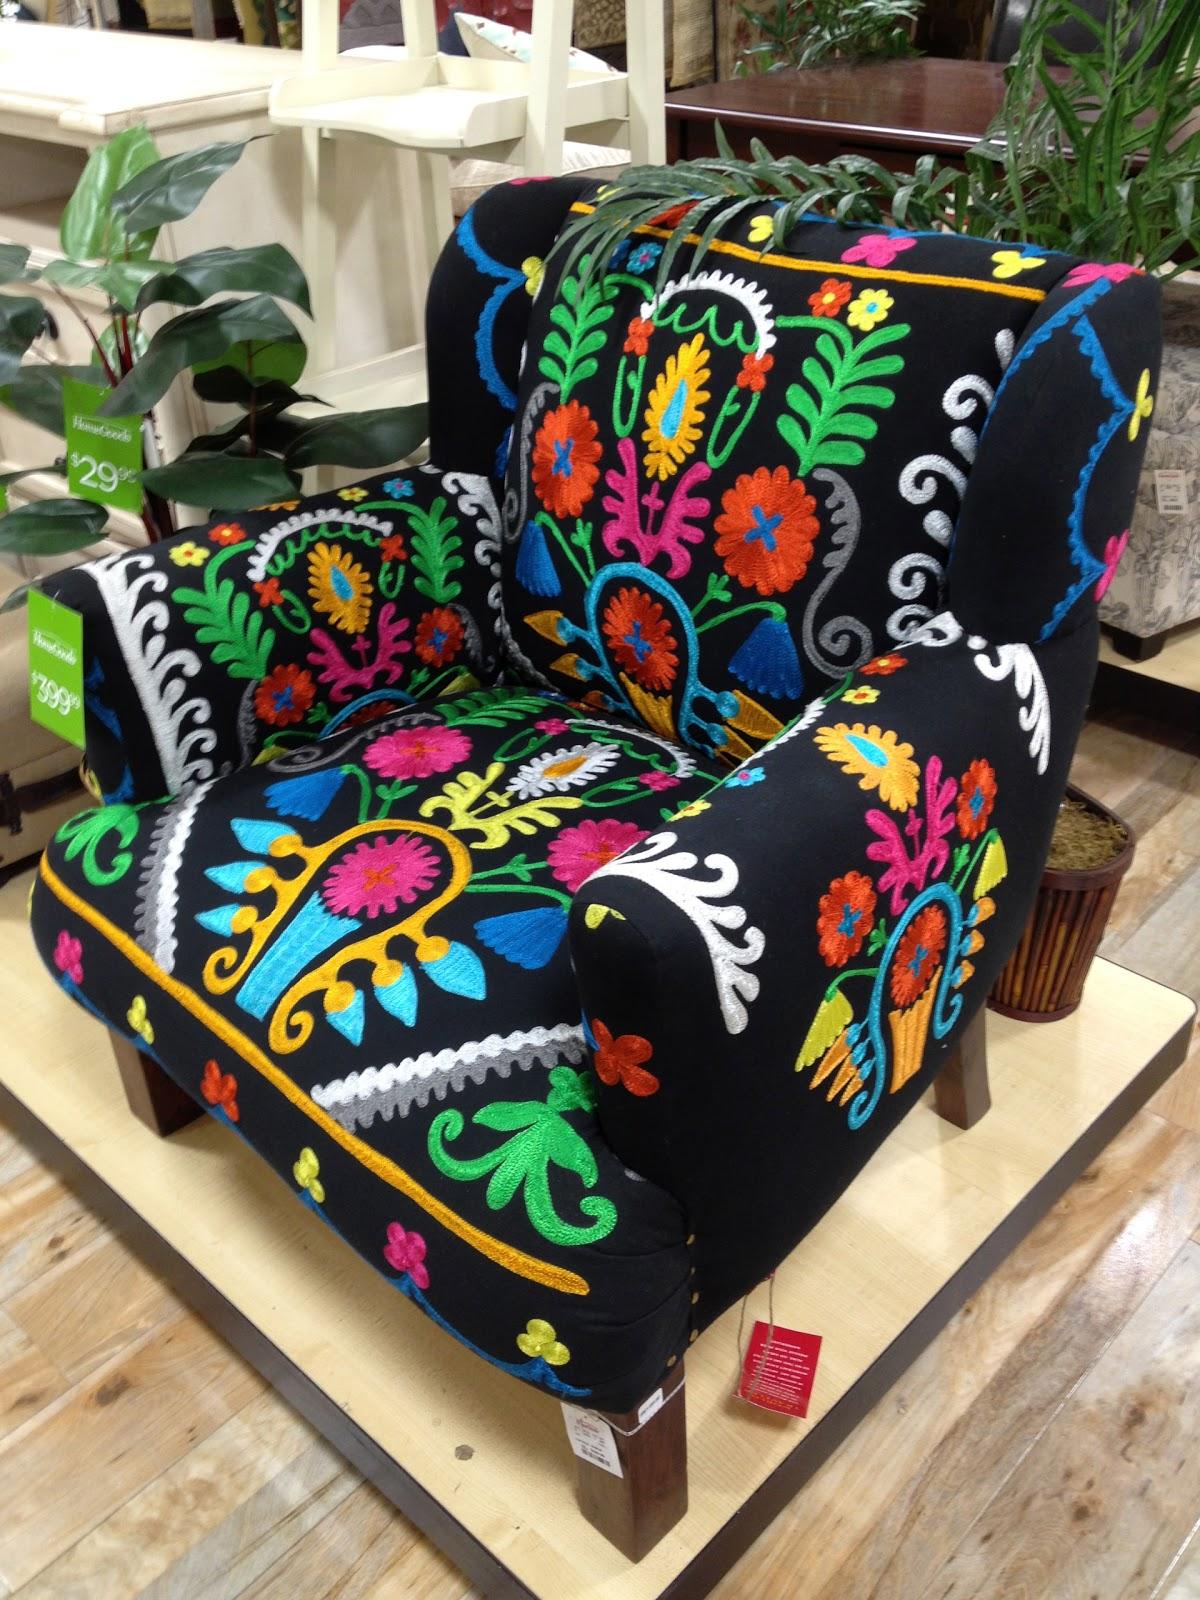 Homegoods Chair Cushions Off 73, Home Goods Chair Cushions